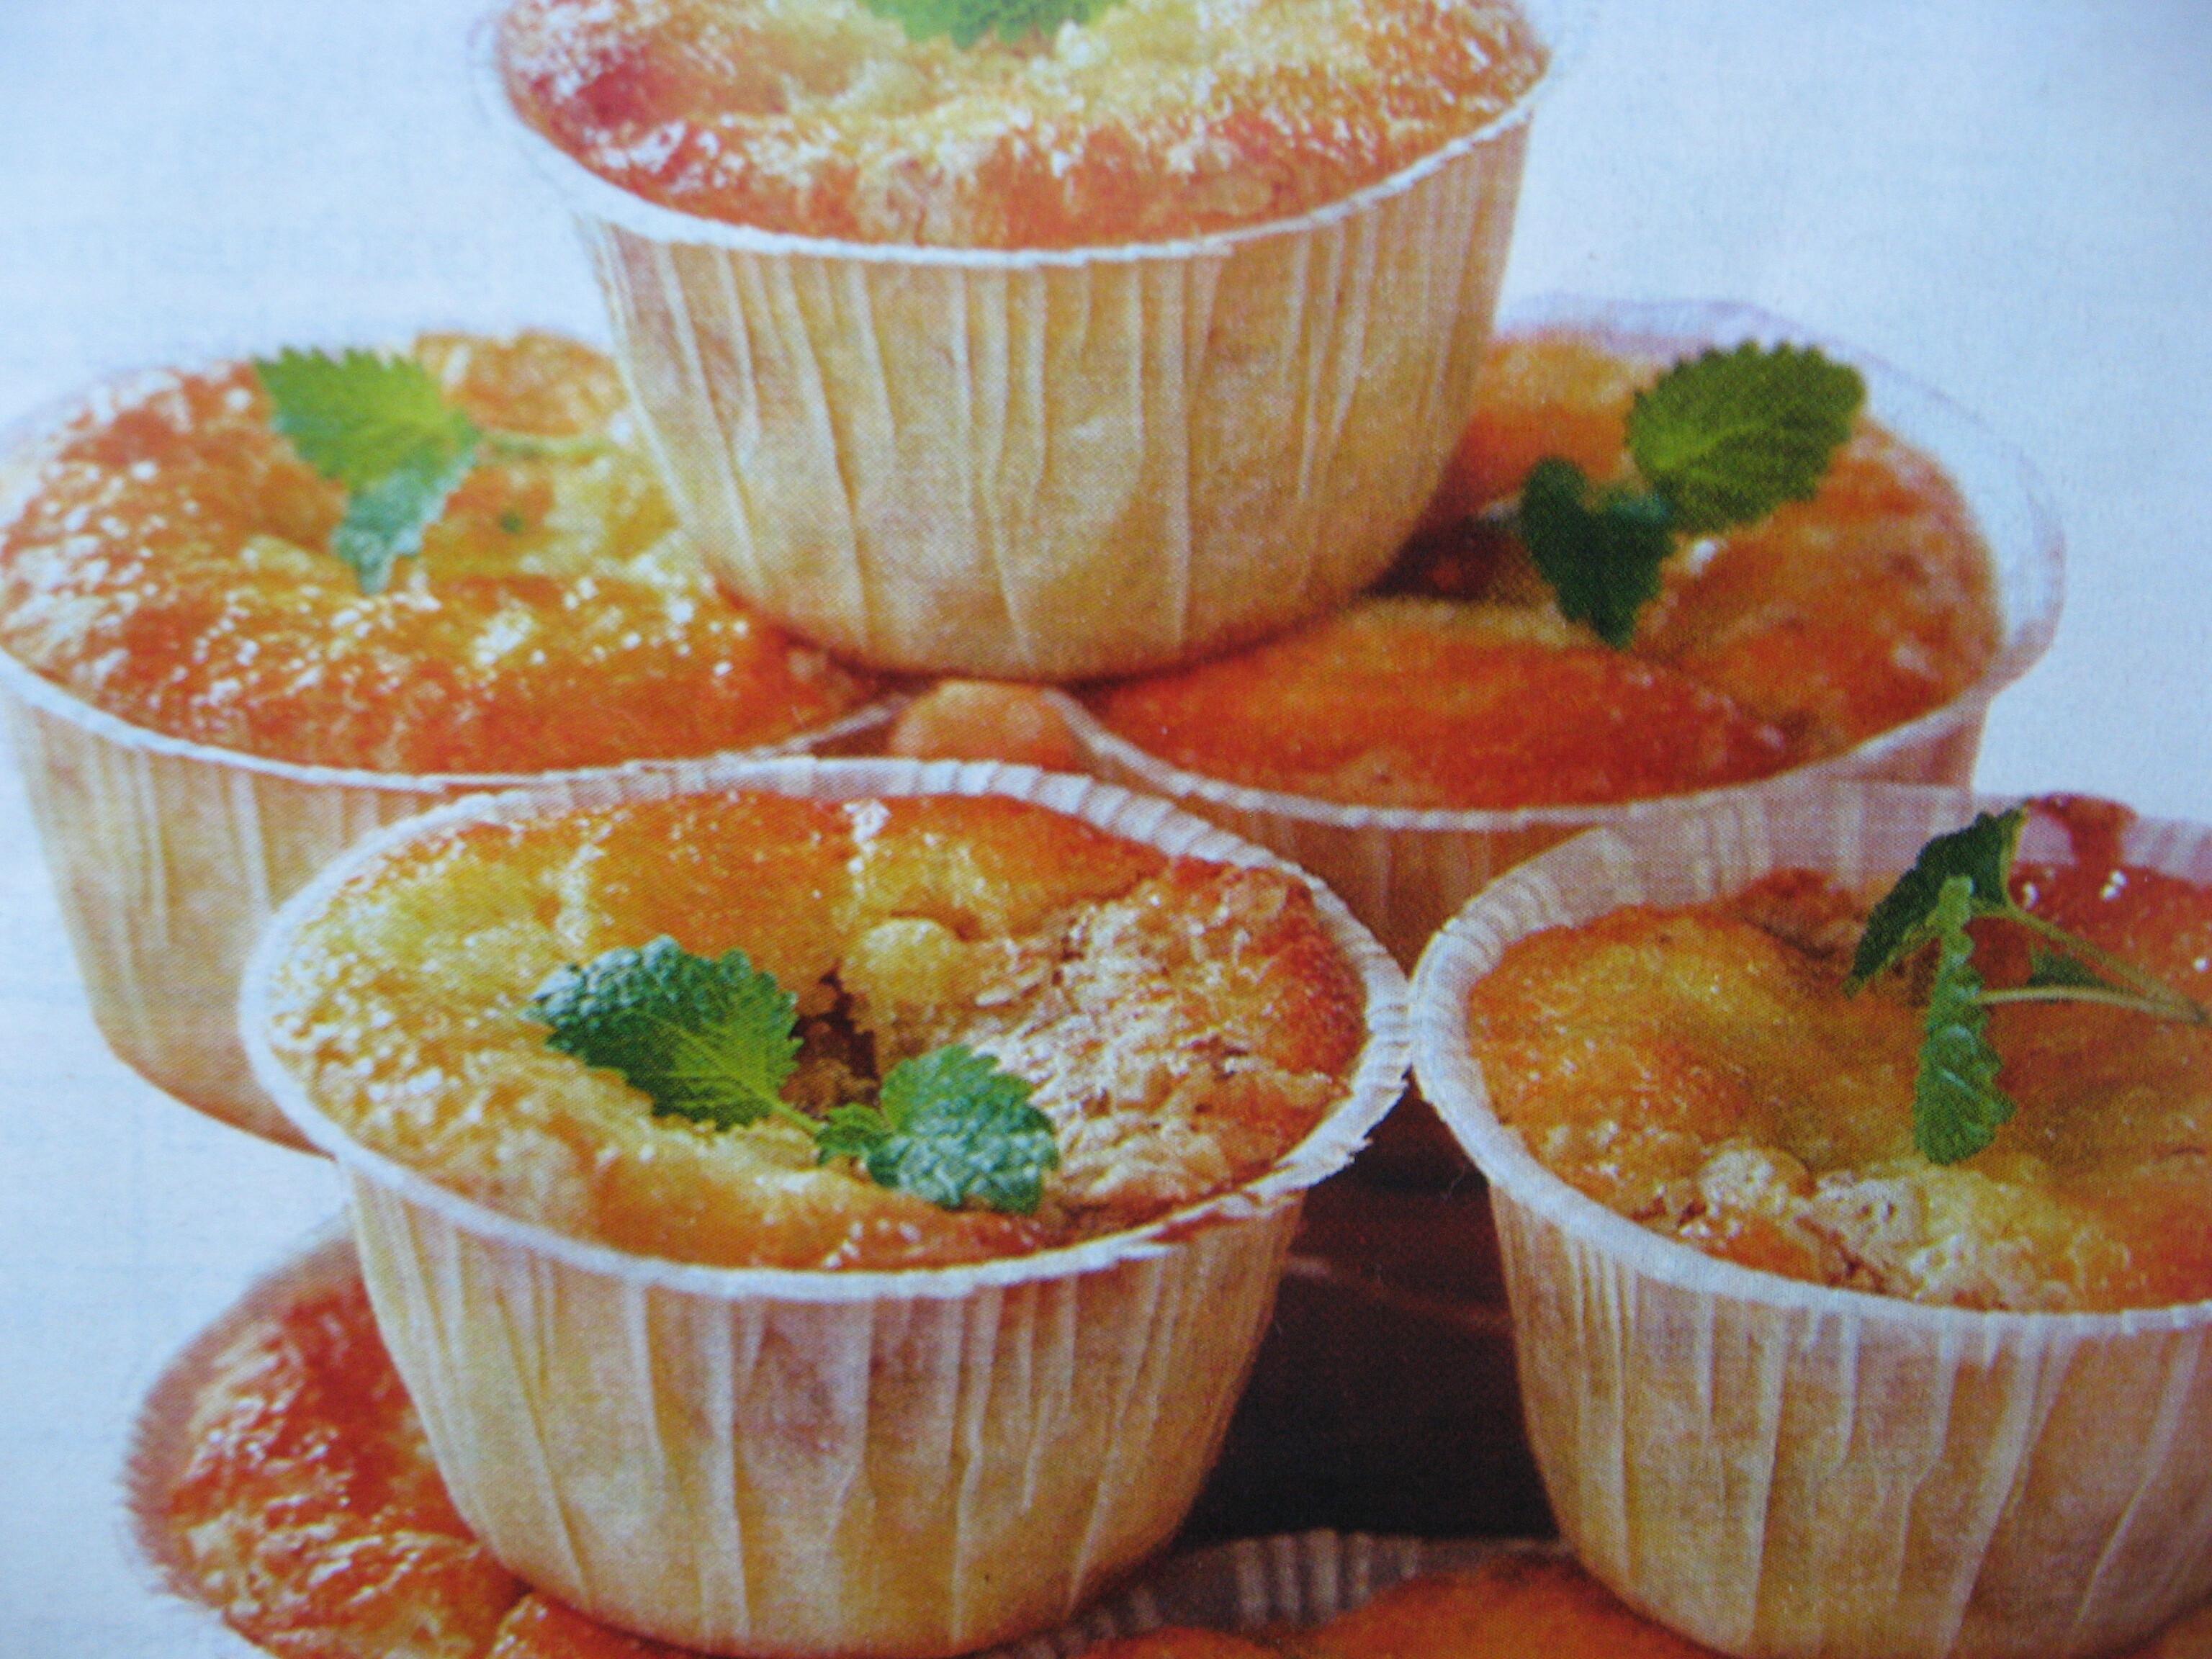 äppelmuffins med rivet äpple